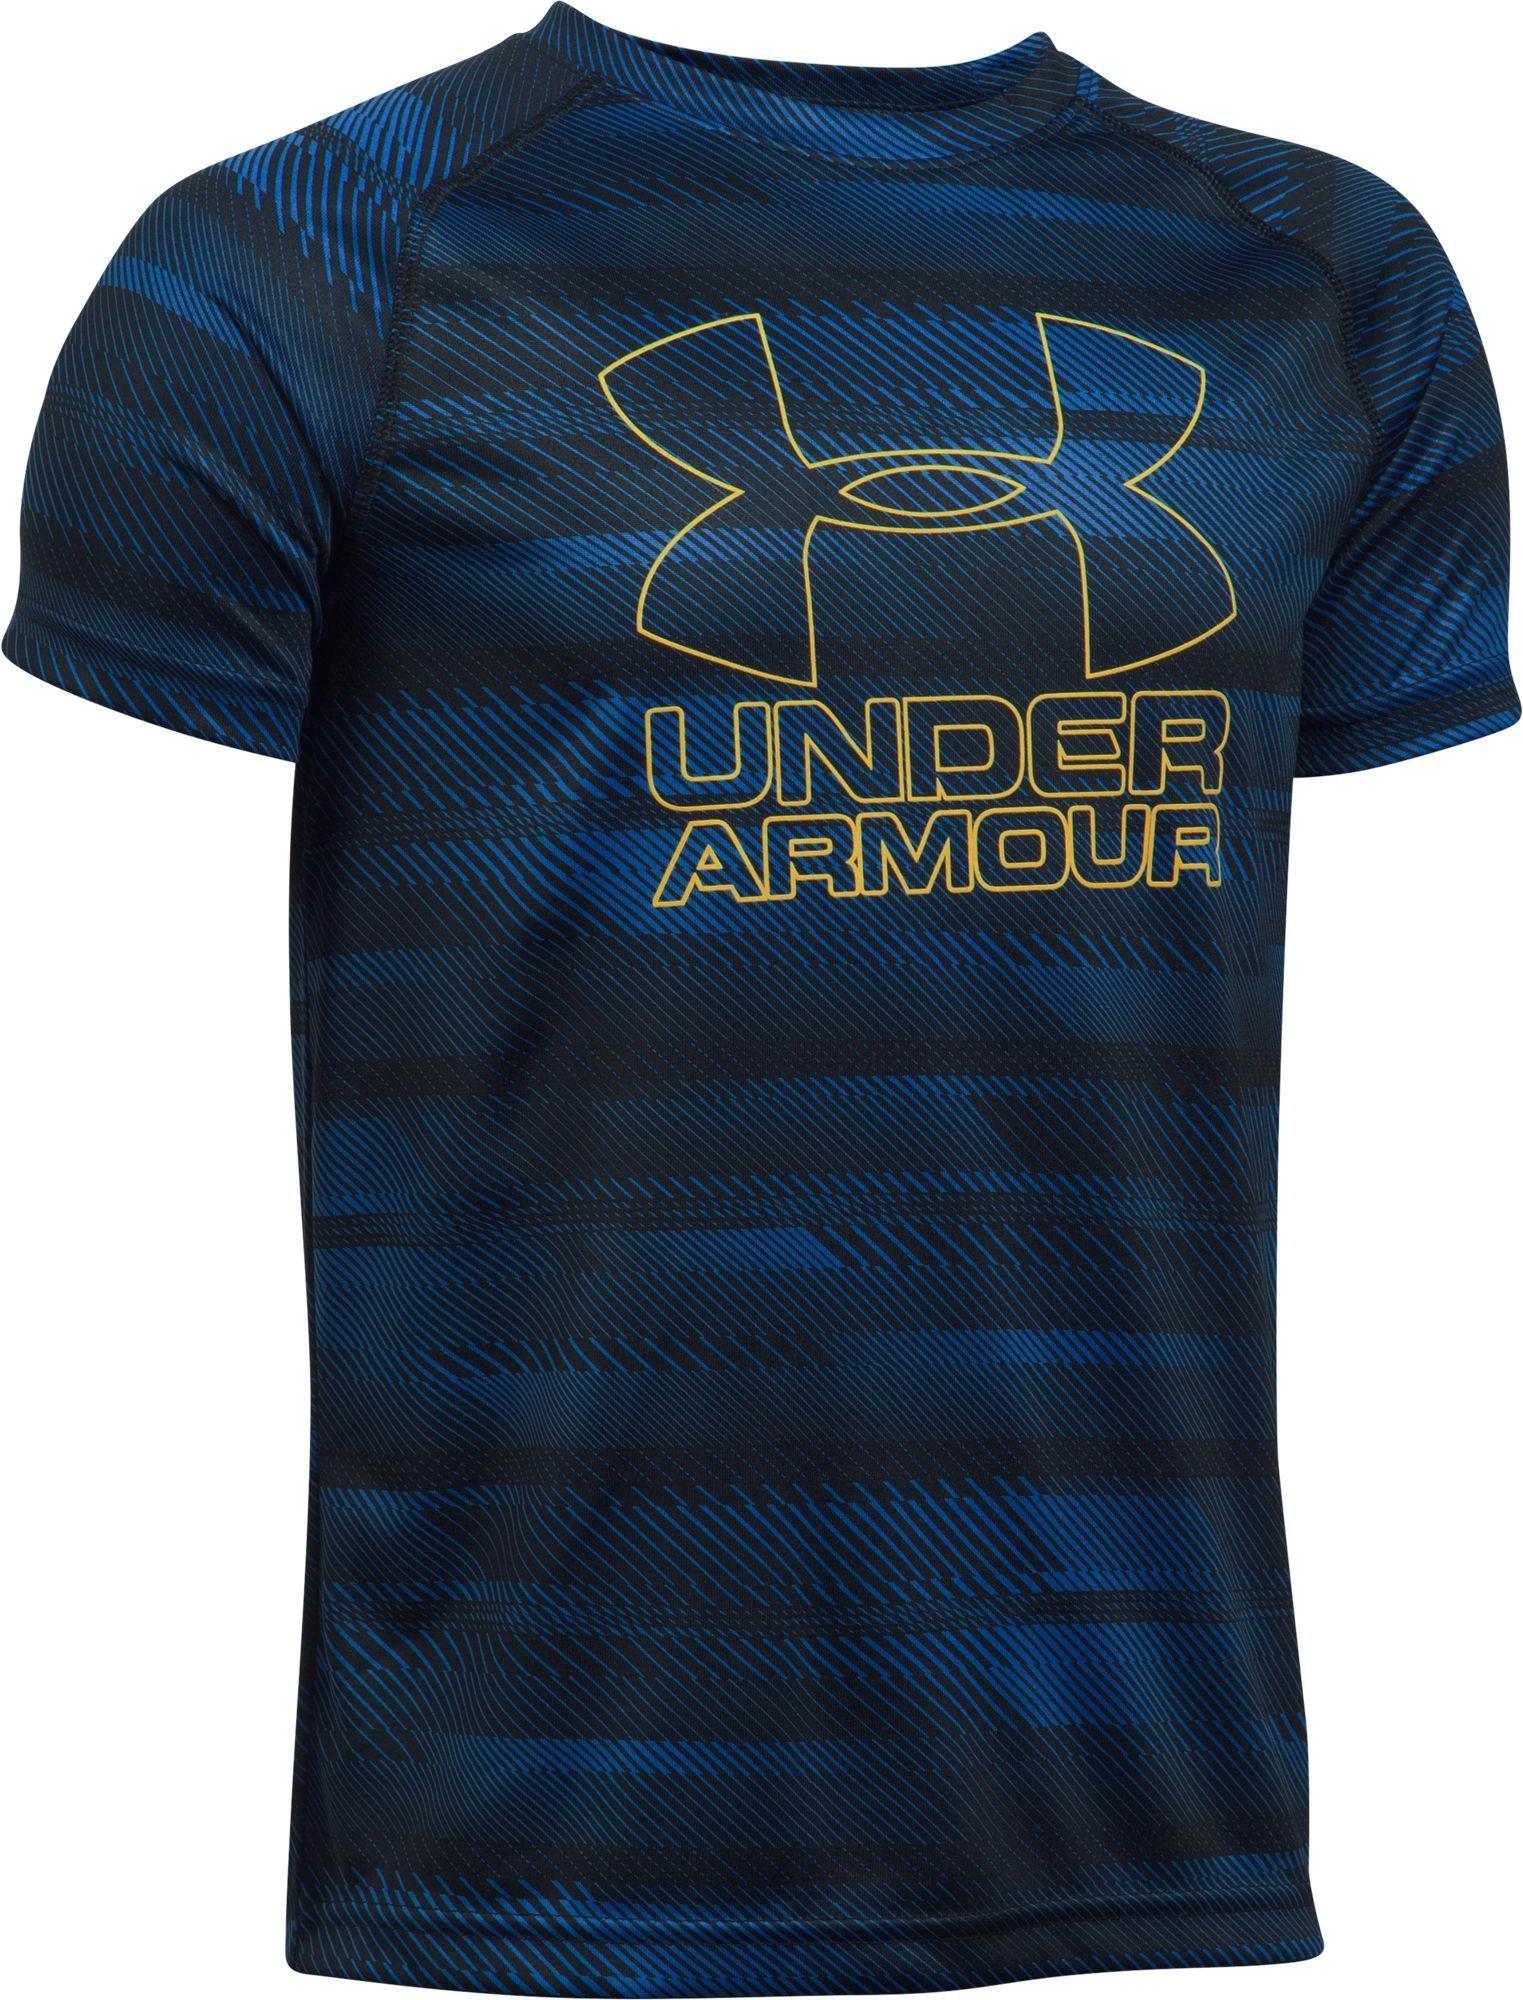 Under Armour Boys' Big Logo Printed T-Shirt, Size: Medium ...